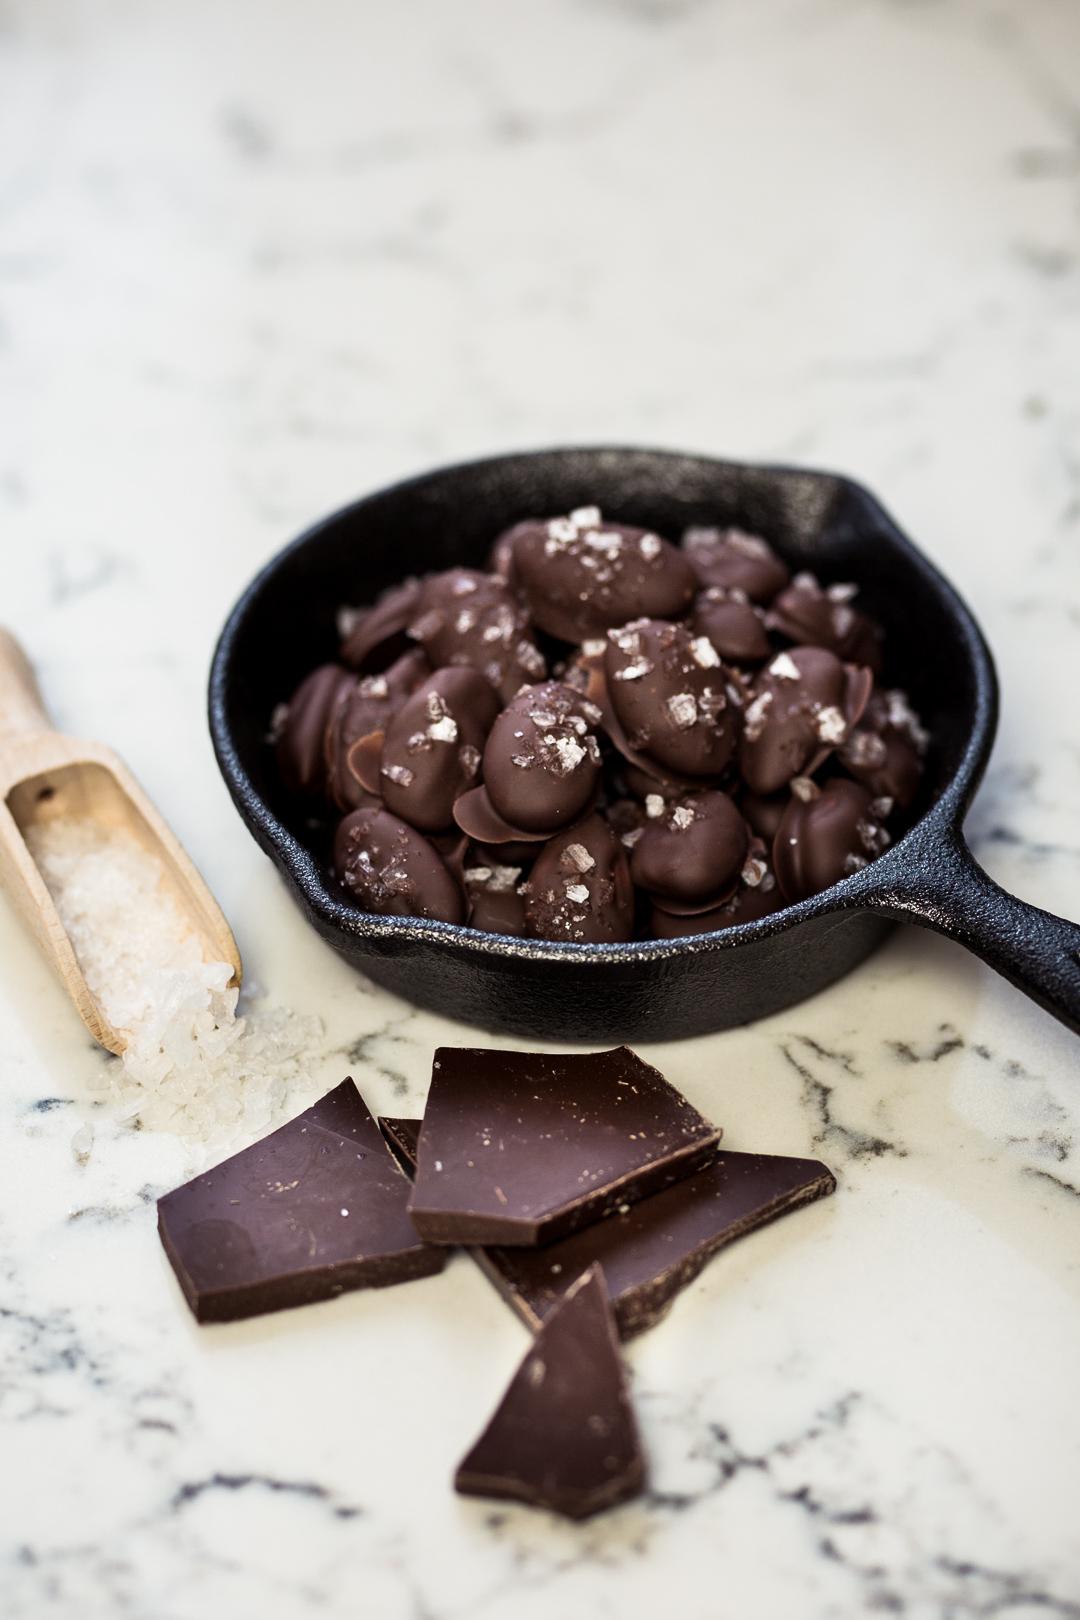 california-almonds-silvester-snacks-anna-frost-03